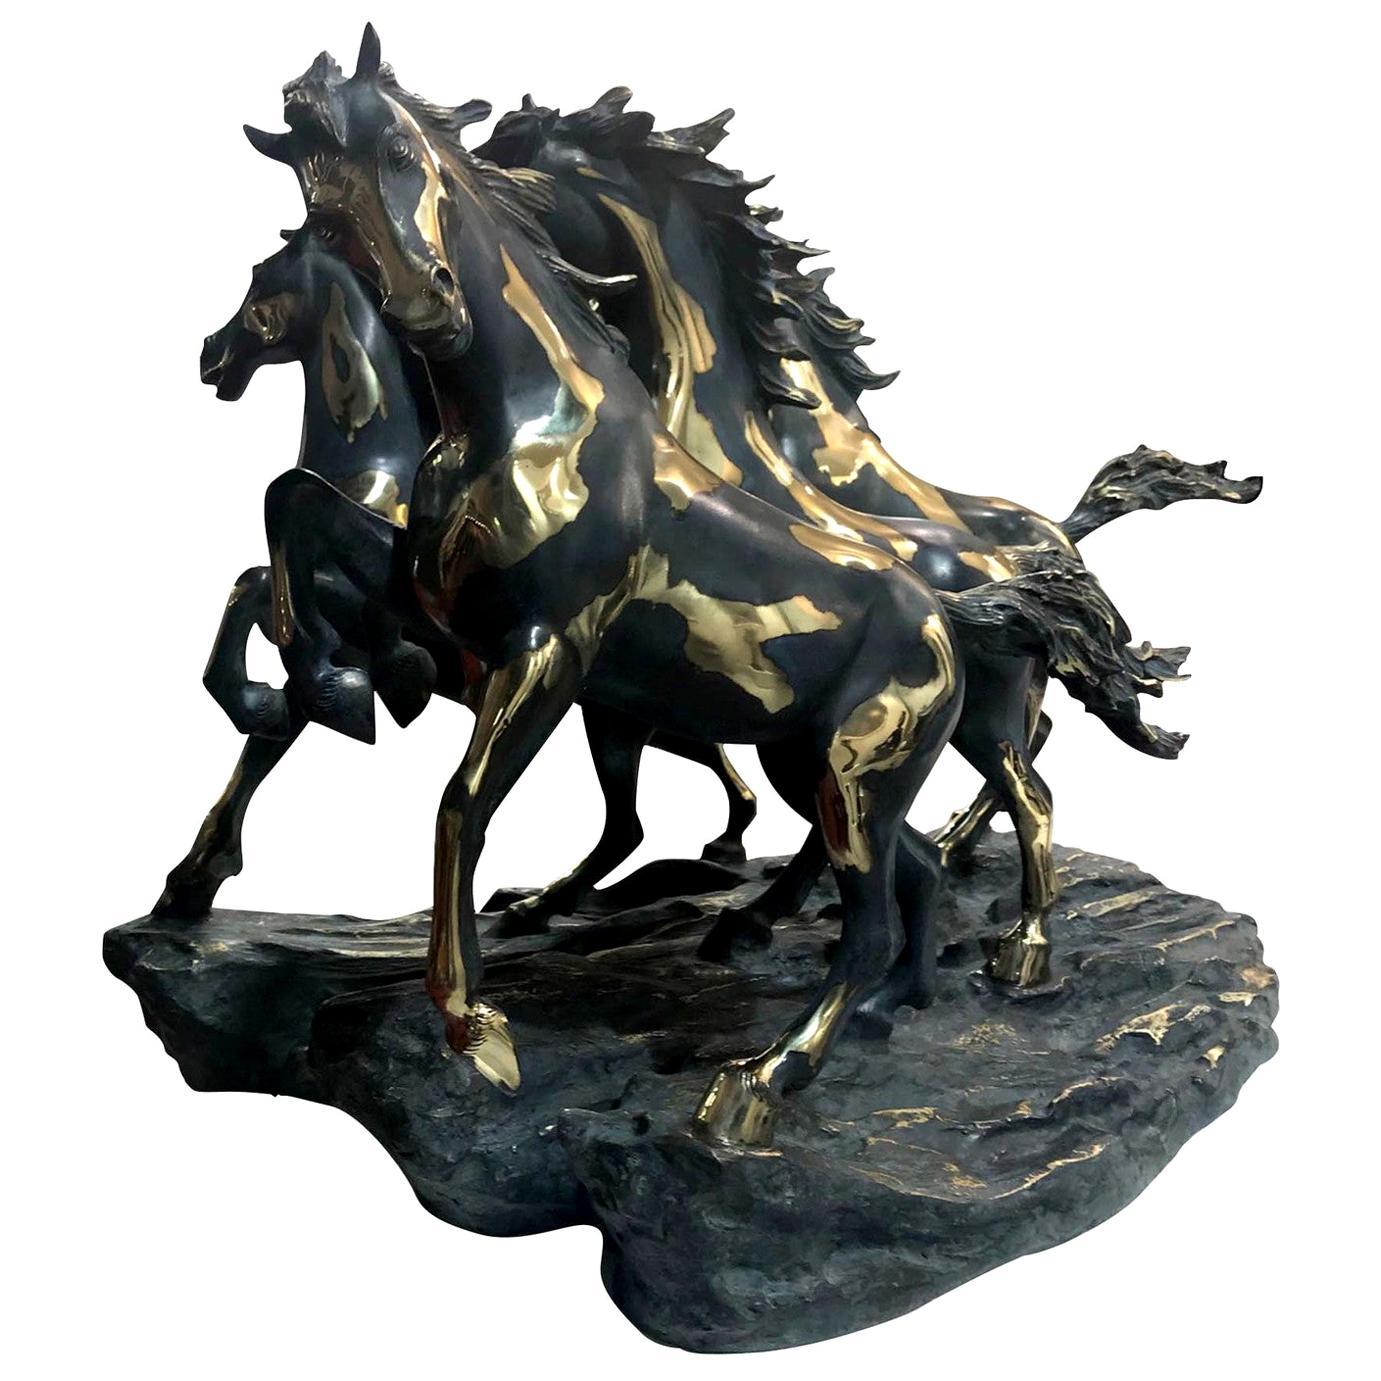 Herd of Horses Statuette